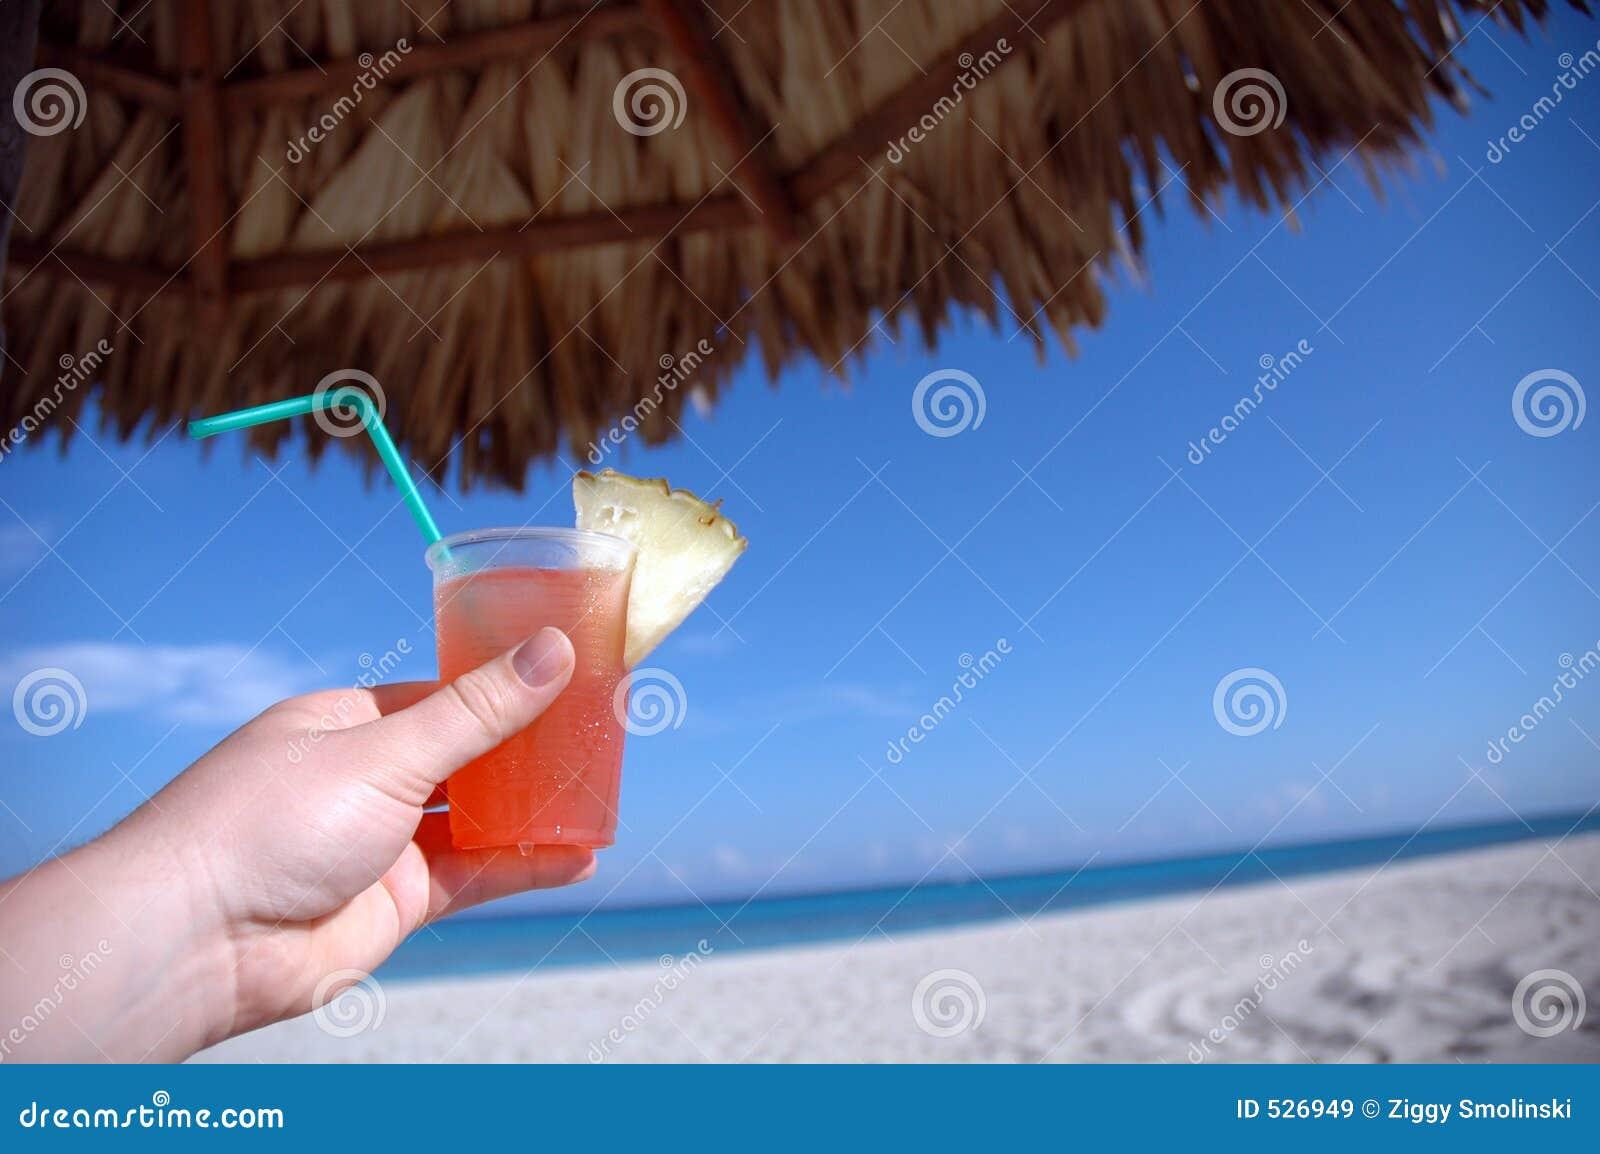 Download 热带古巴的饮料 库存图片. 图片 包括有 鸡尾酒, 热带, 菠萝, 加勒比, 叶子, 放松, 假期, 烘干, 结构树 - 526949